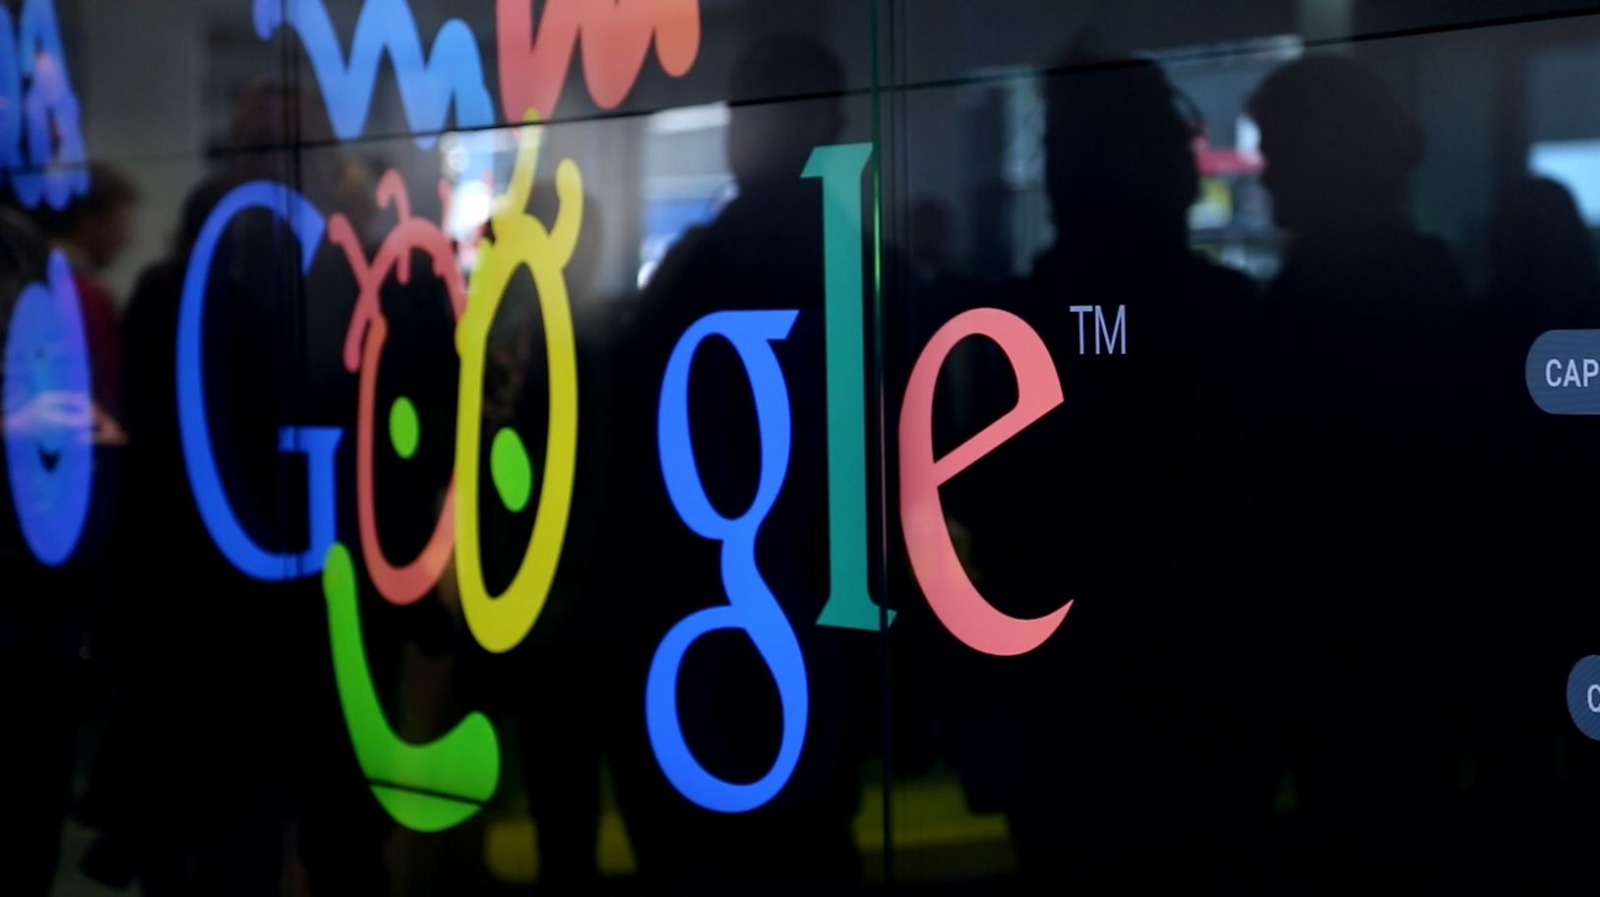 World's first Google shop in London